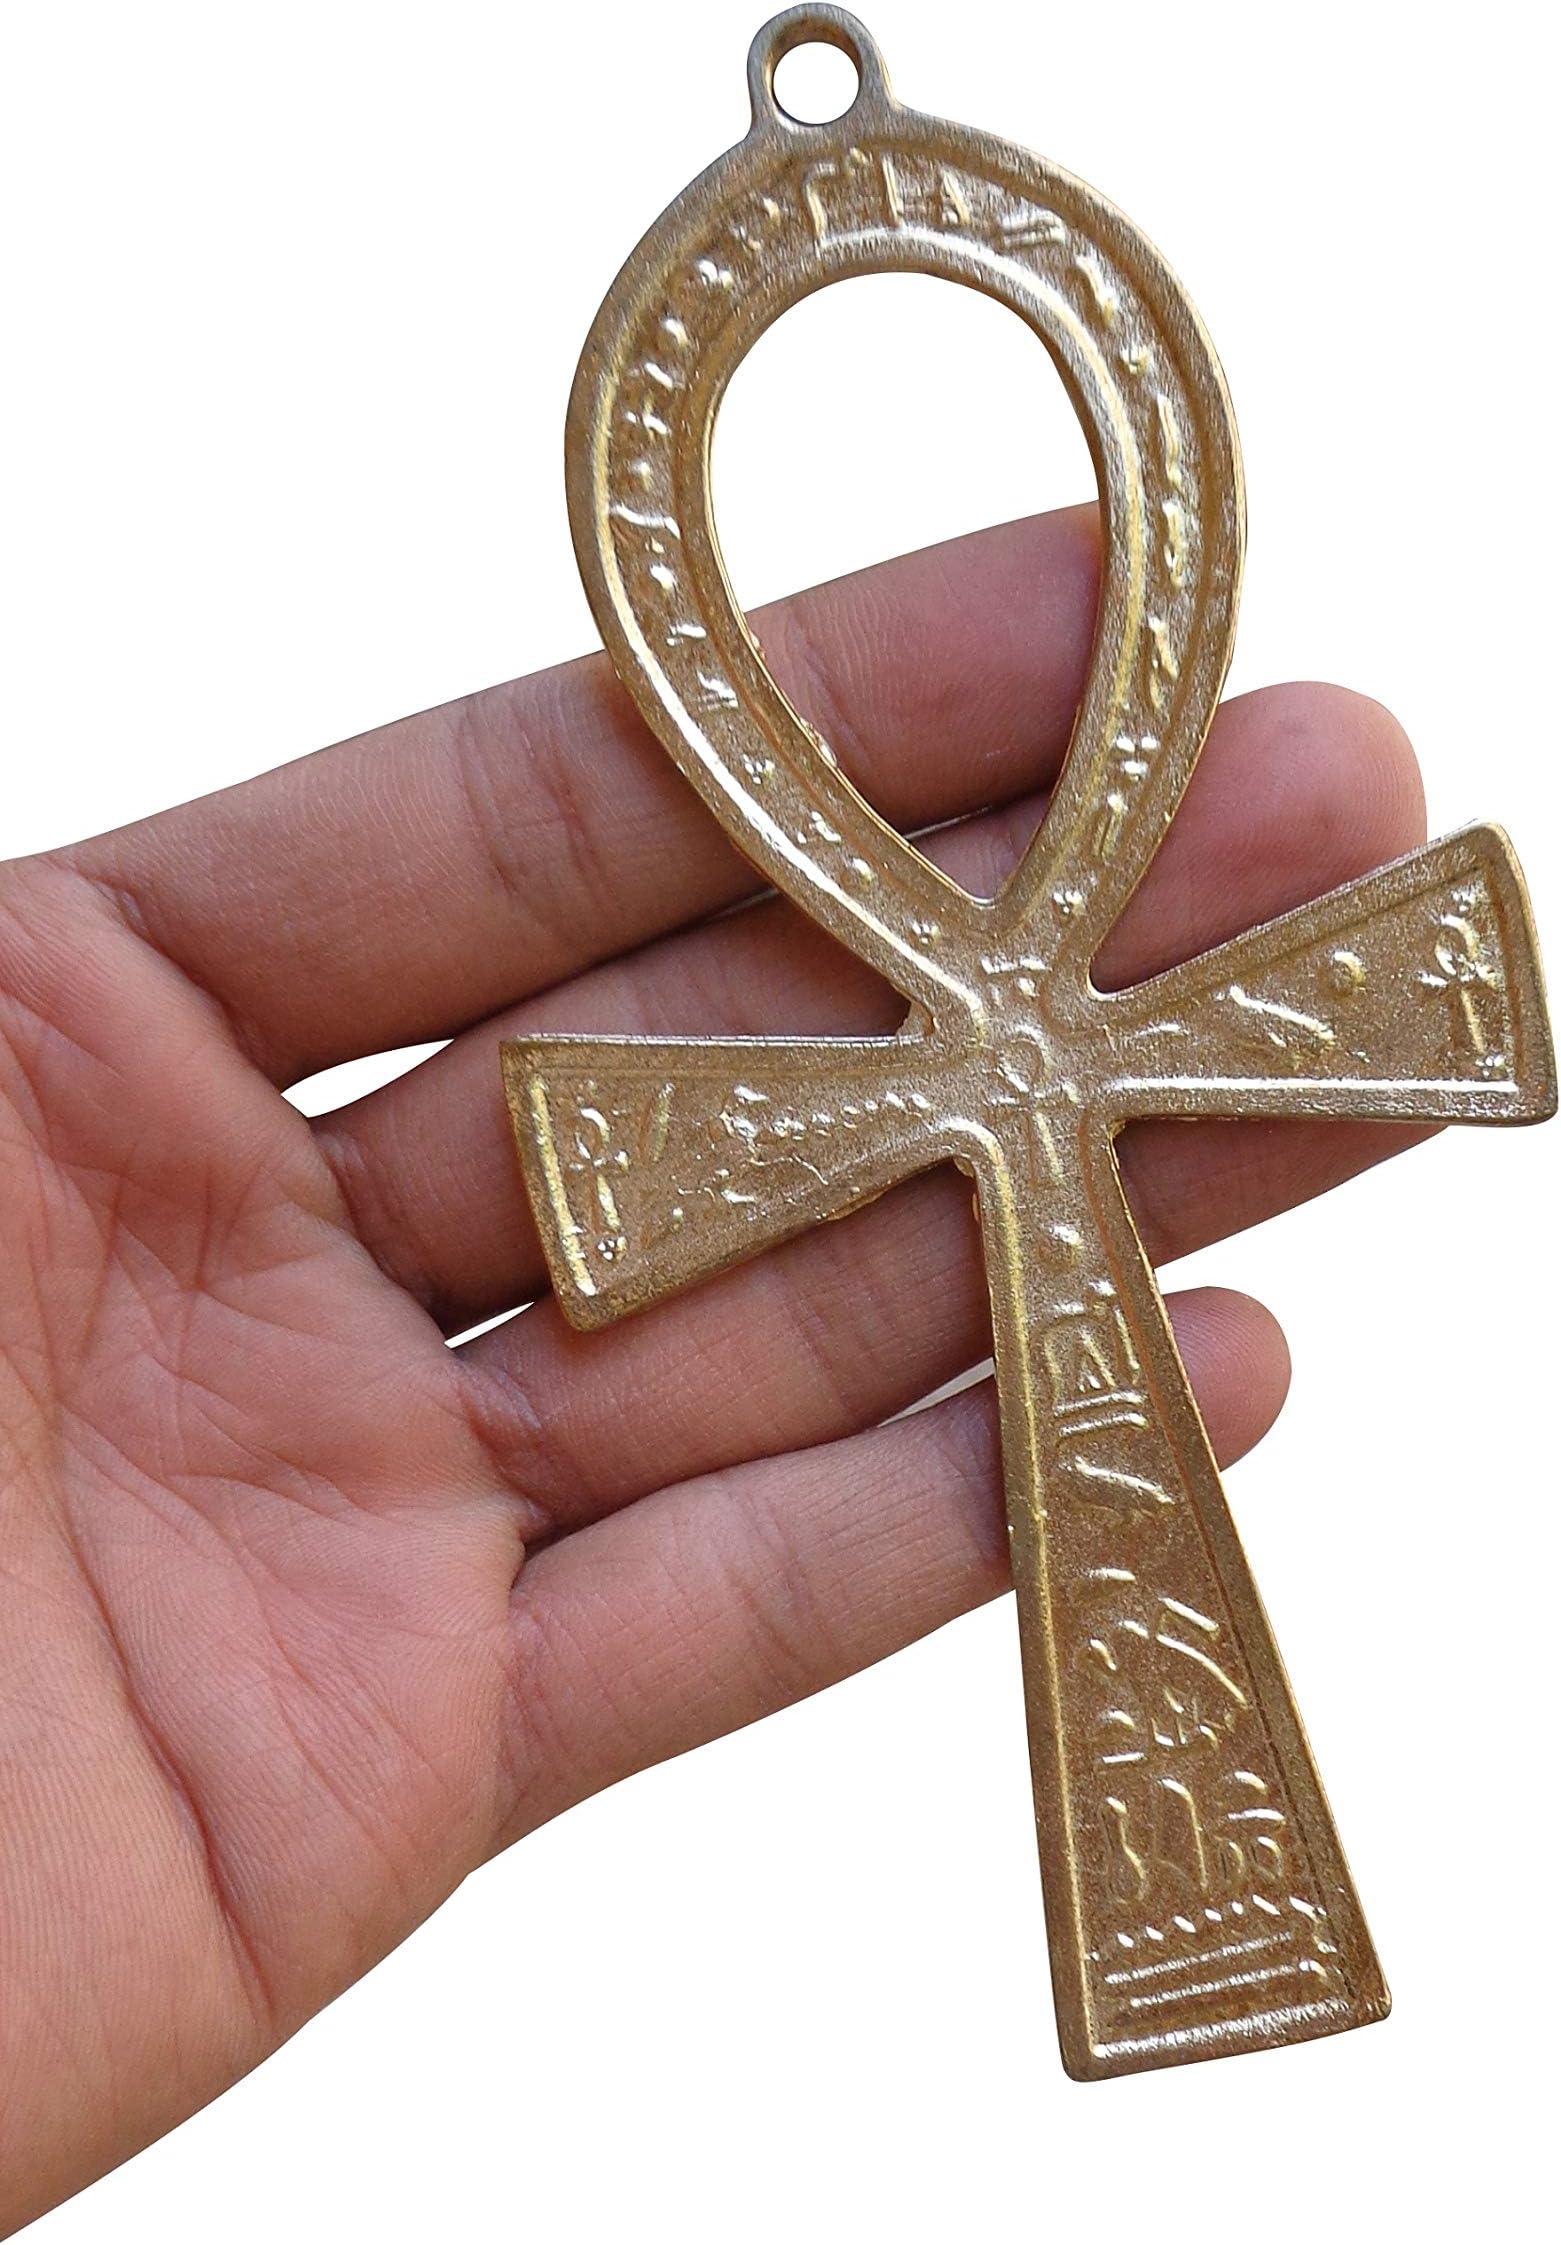 Cross of Life Crux Ansata Cross of LIFE Stamp Ankh EGYPTIAN Cross Stamp Egyptian Cross Handmade stamp Ankh Stamp ANKH Rubber Stamp